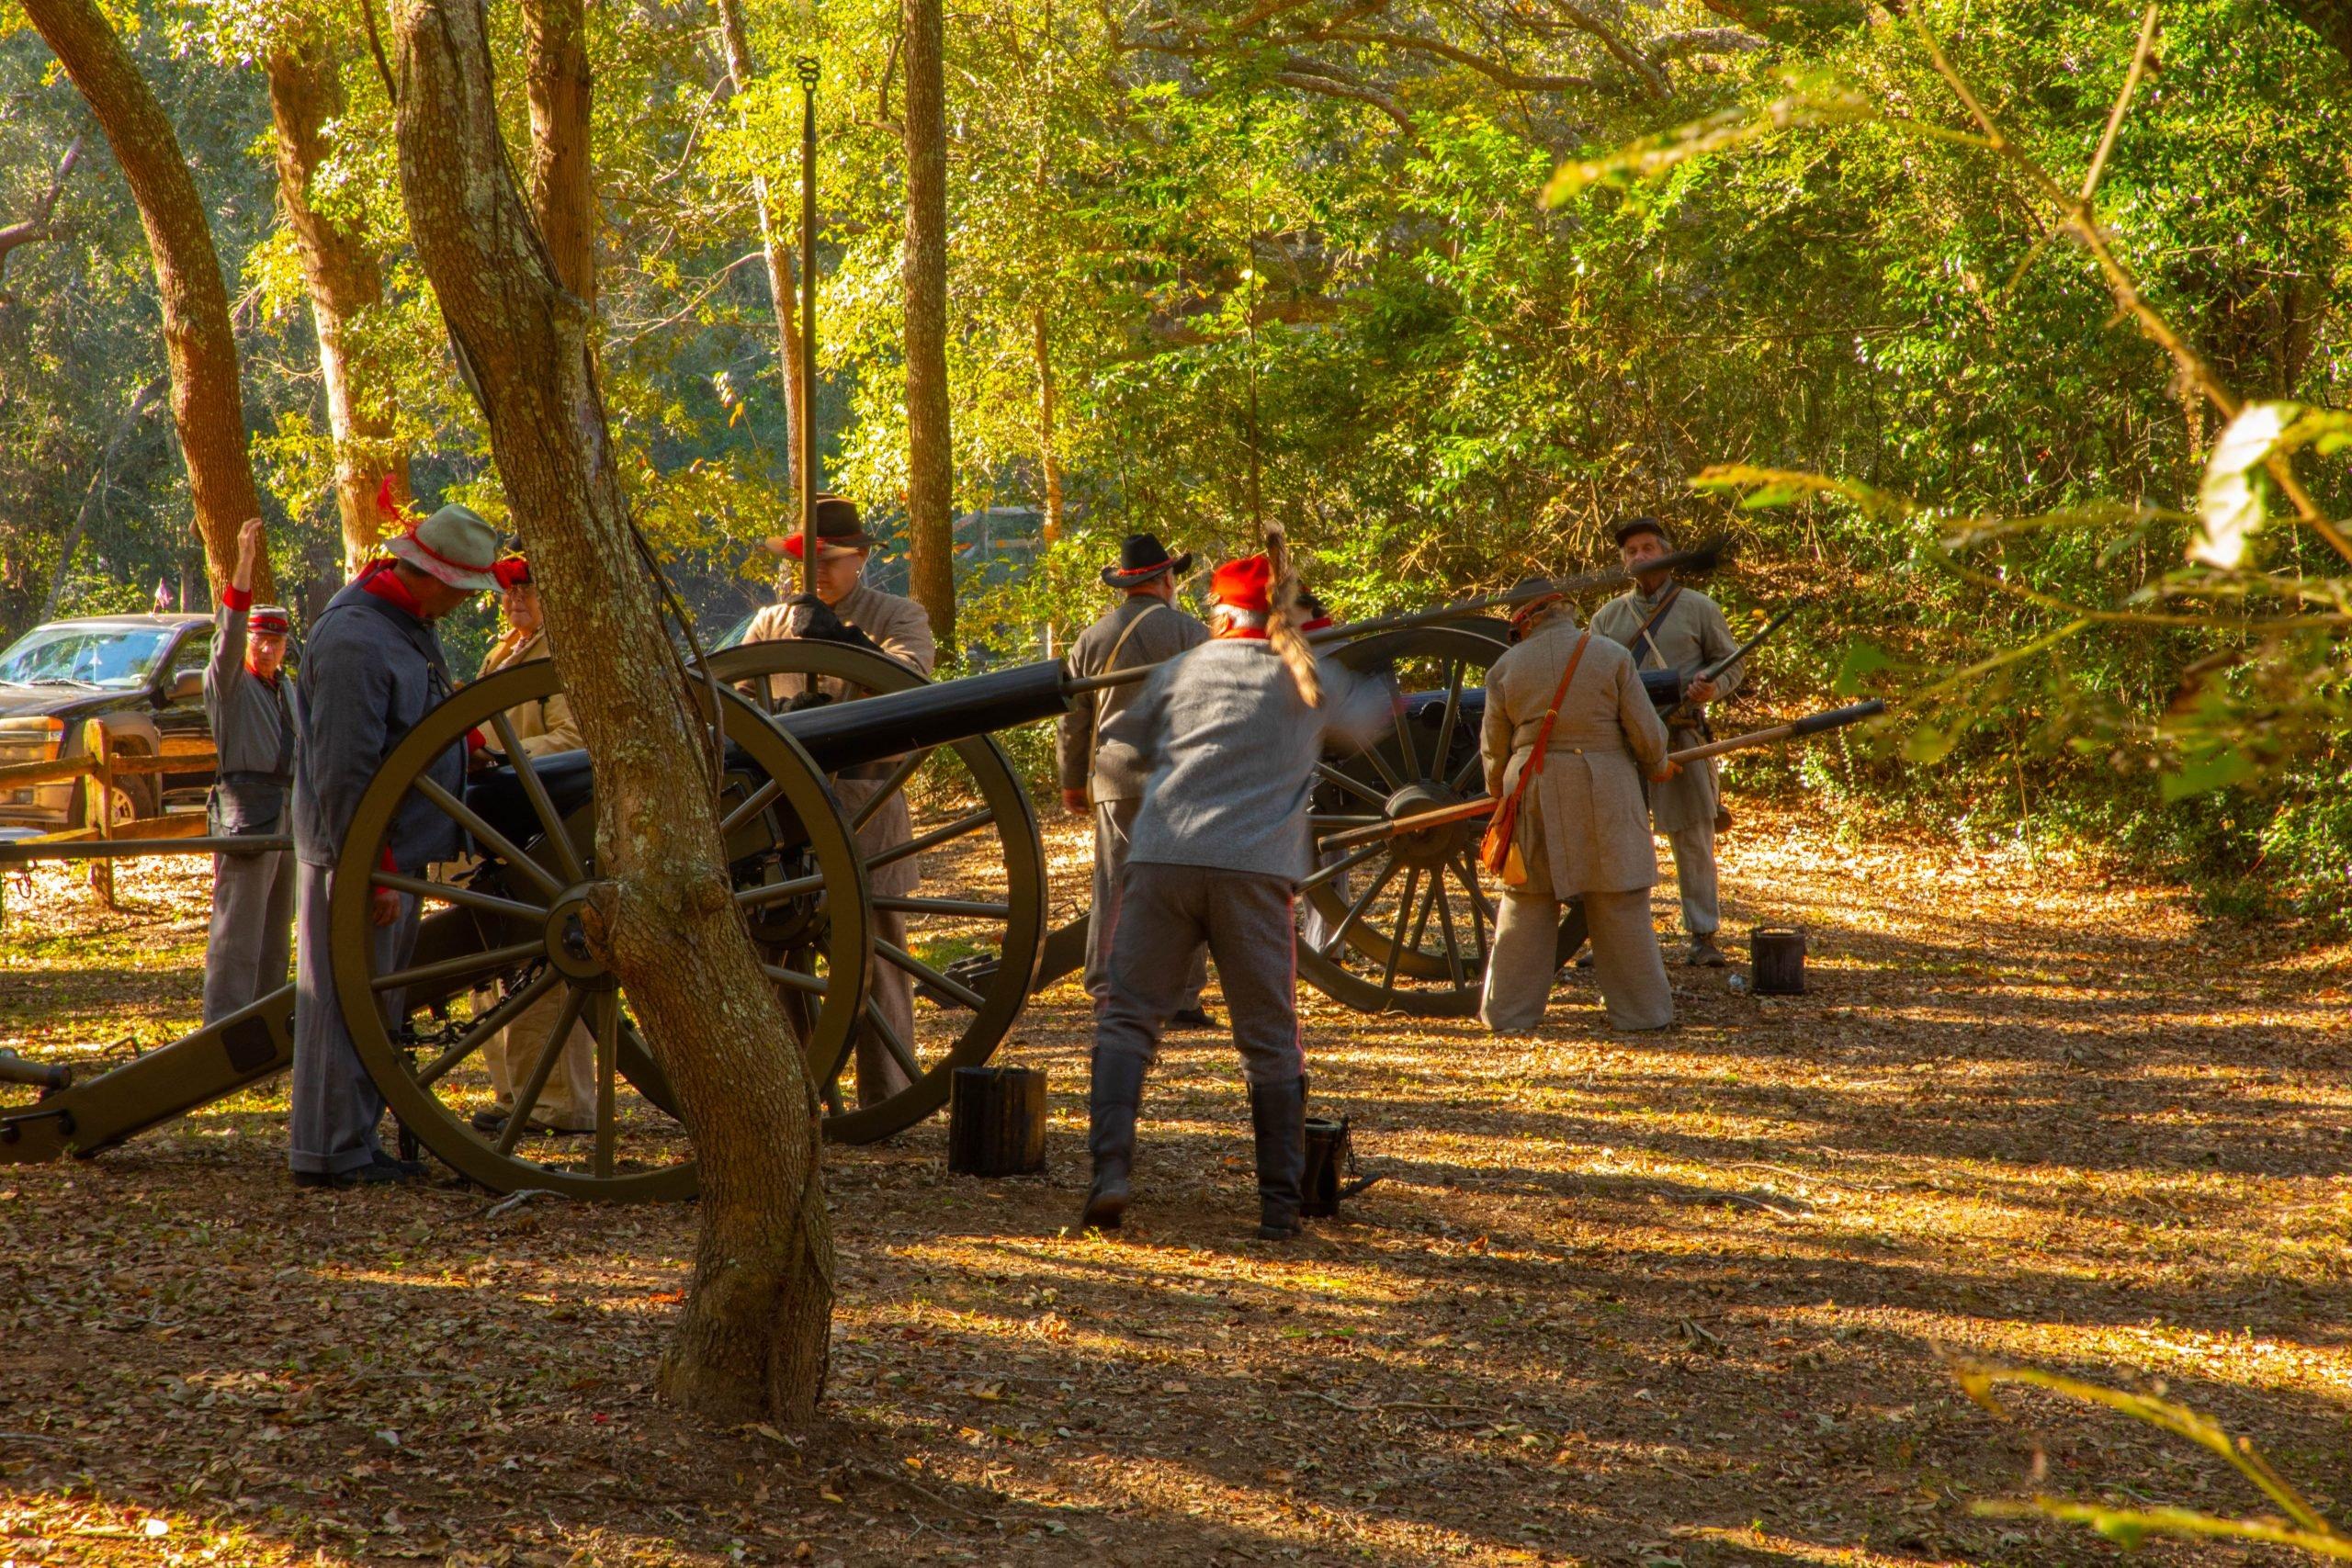 Sons of Confederate Veterans C.S.A. South Carolina 20